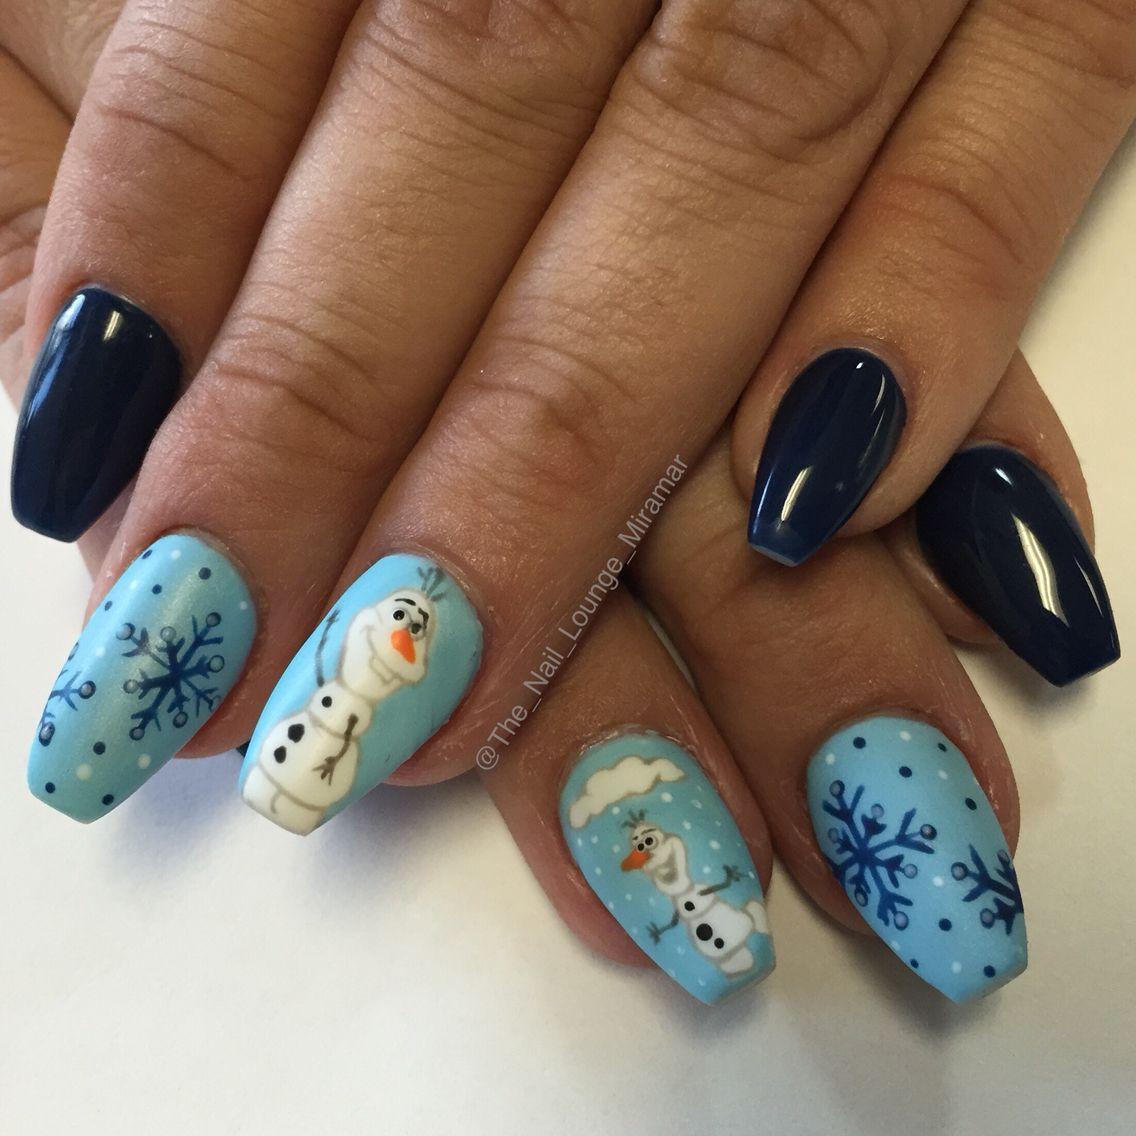 Frozen\' Olaf nail art design | Nail Art | Pinterest | Olaf nails ...